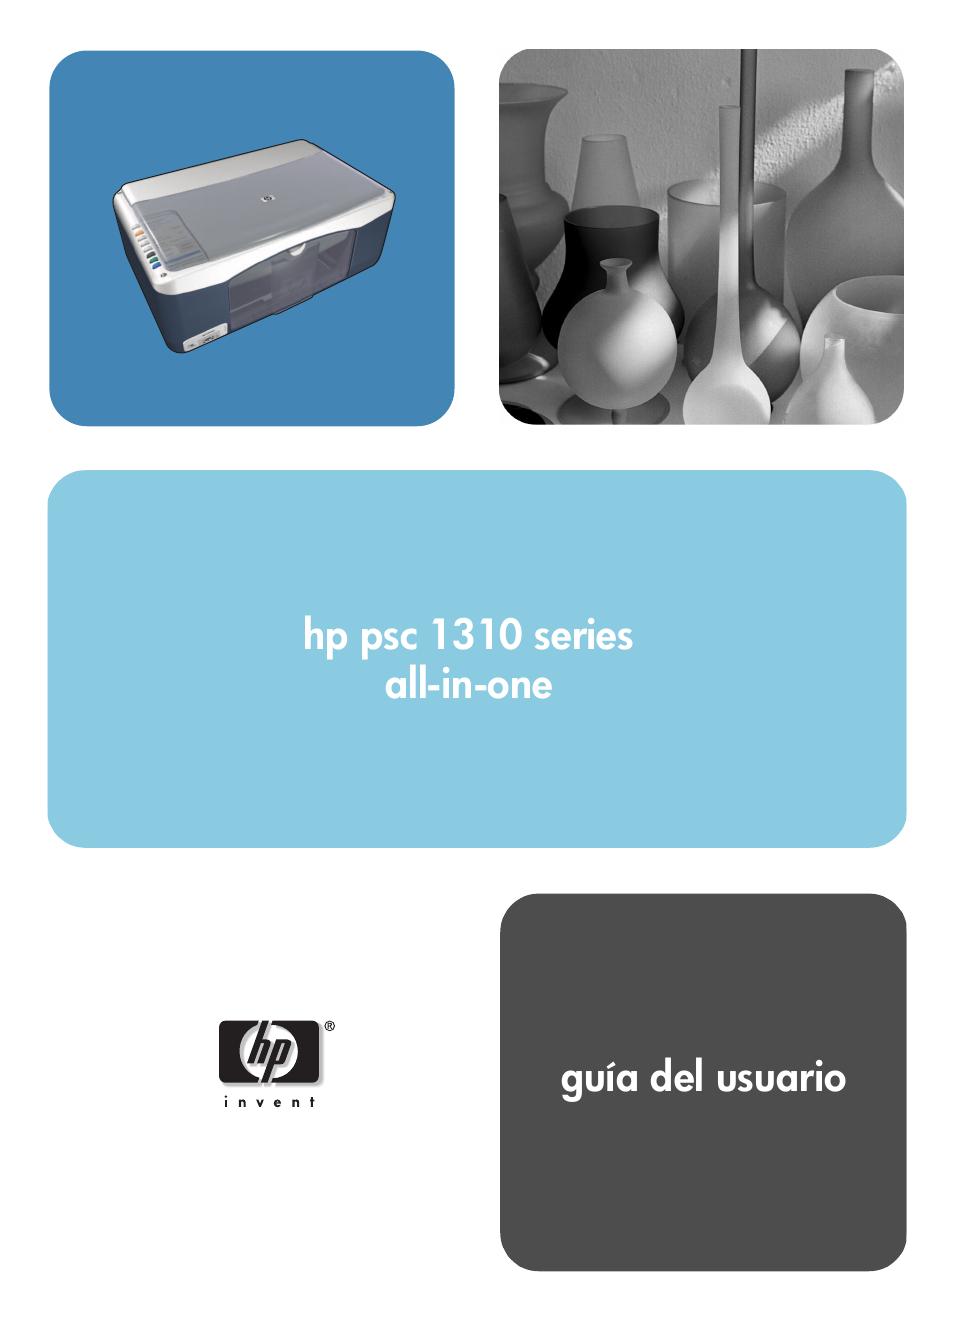 hp impresora todo en uno hp psc 1315 manual del usuario p ginas 86 rh pdfmanuales com HP PSC 1200 Drivers HP PSC 1315 Software Installation